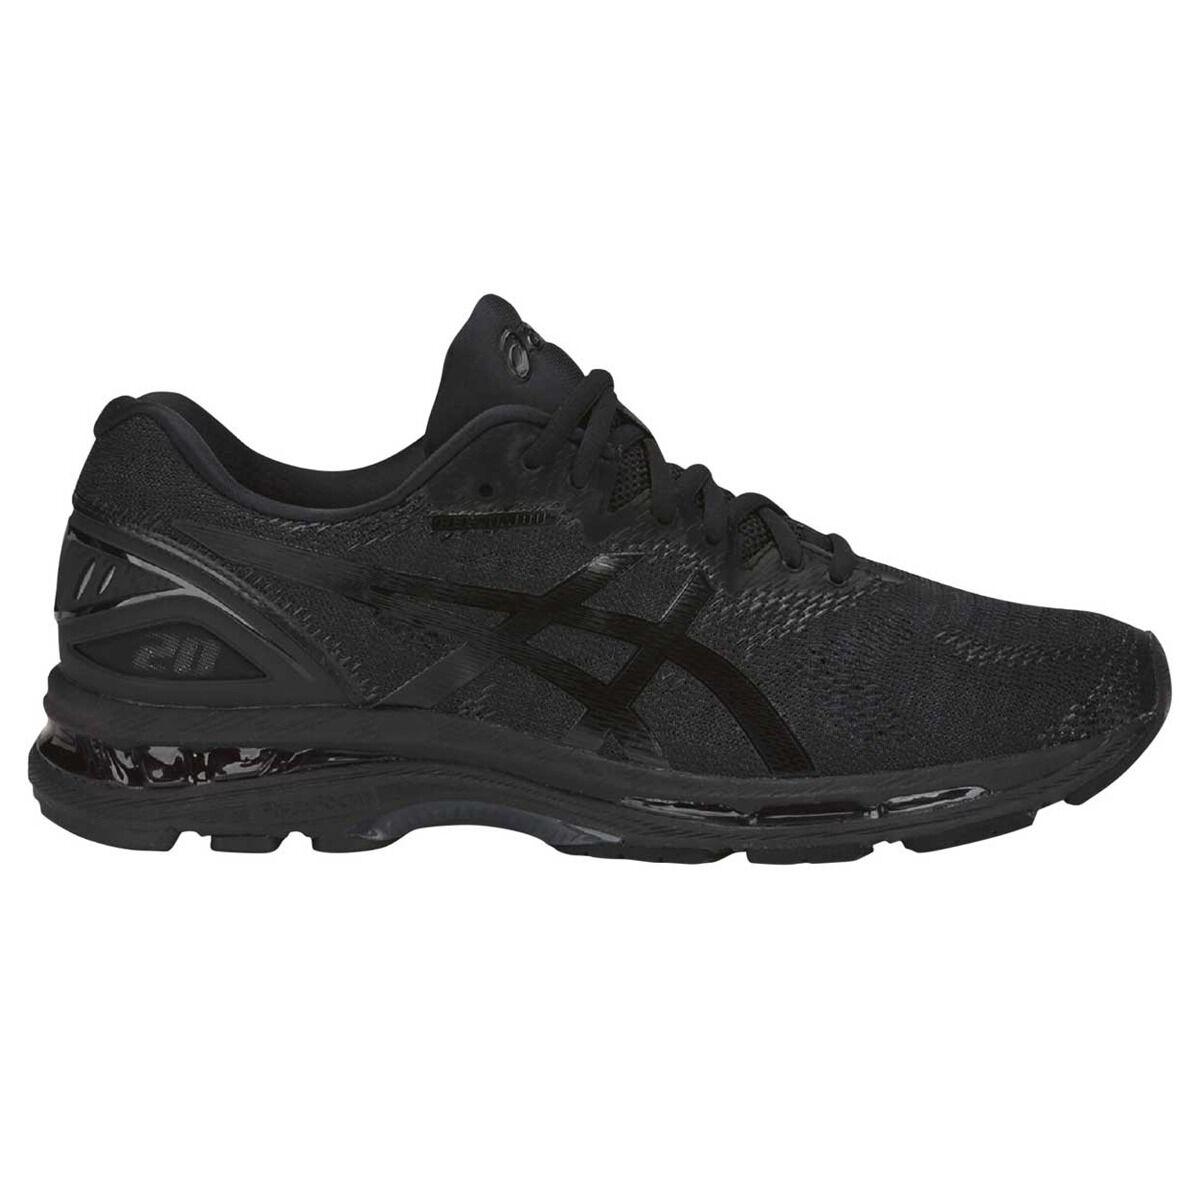 Asics Gel Nimbus 20 Mens Sports Shoes Running PNG, Clipart